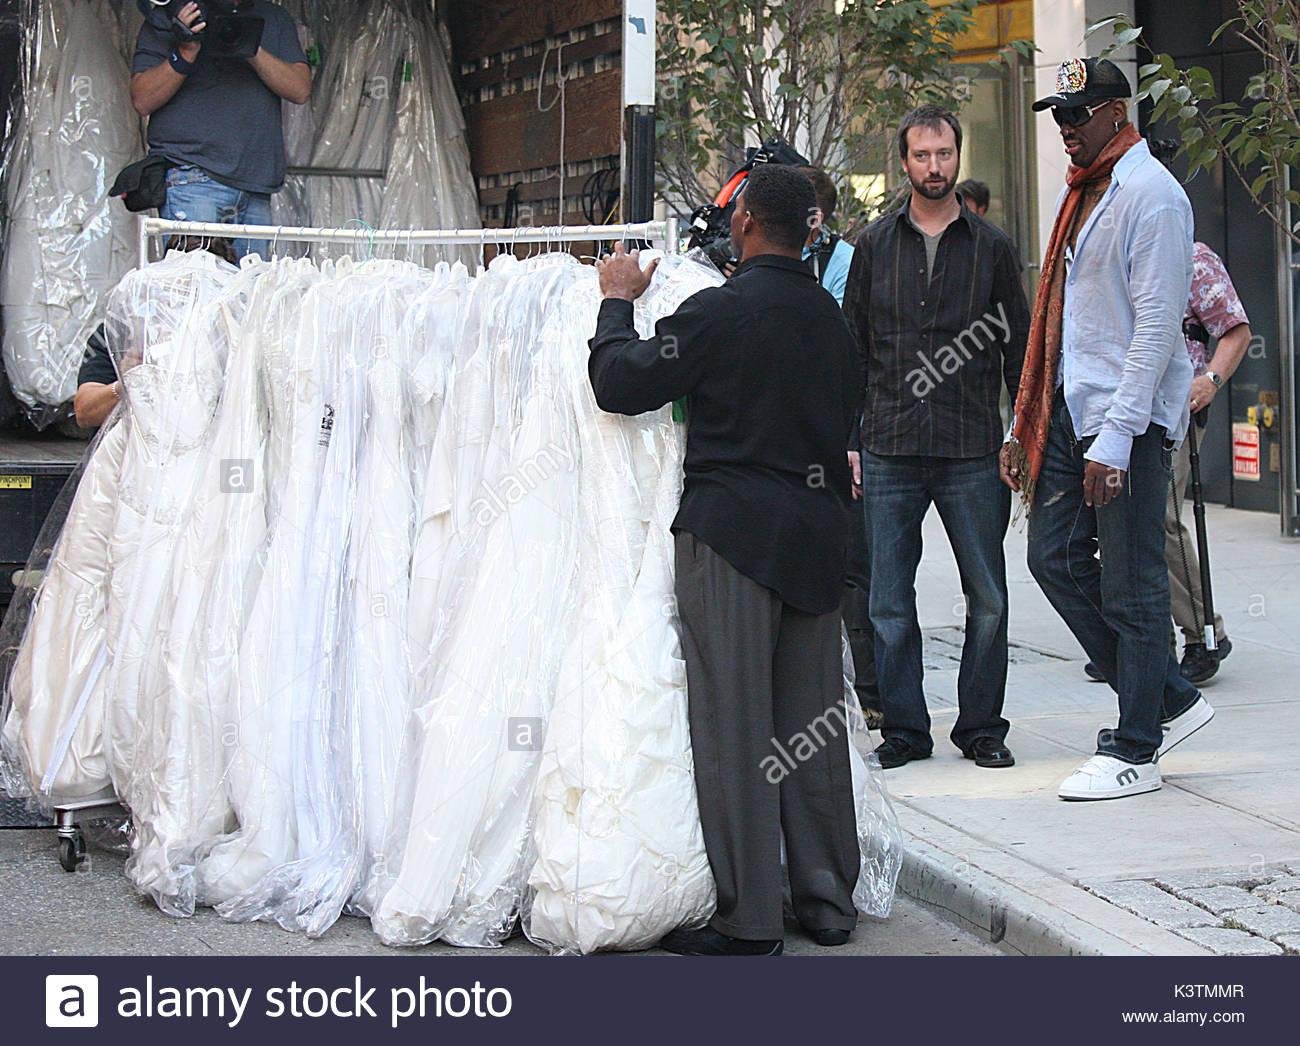 Nett Khloe Kardashian Brautkleid Fotos - Brautkleider Ideen ...